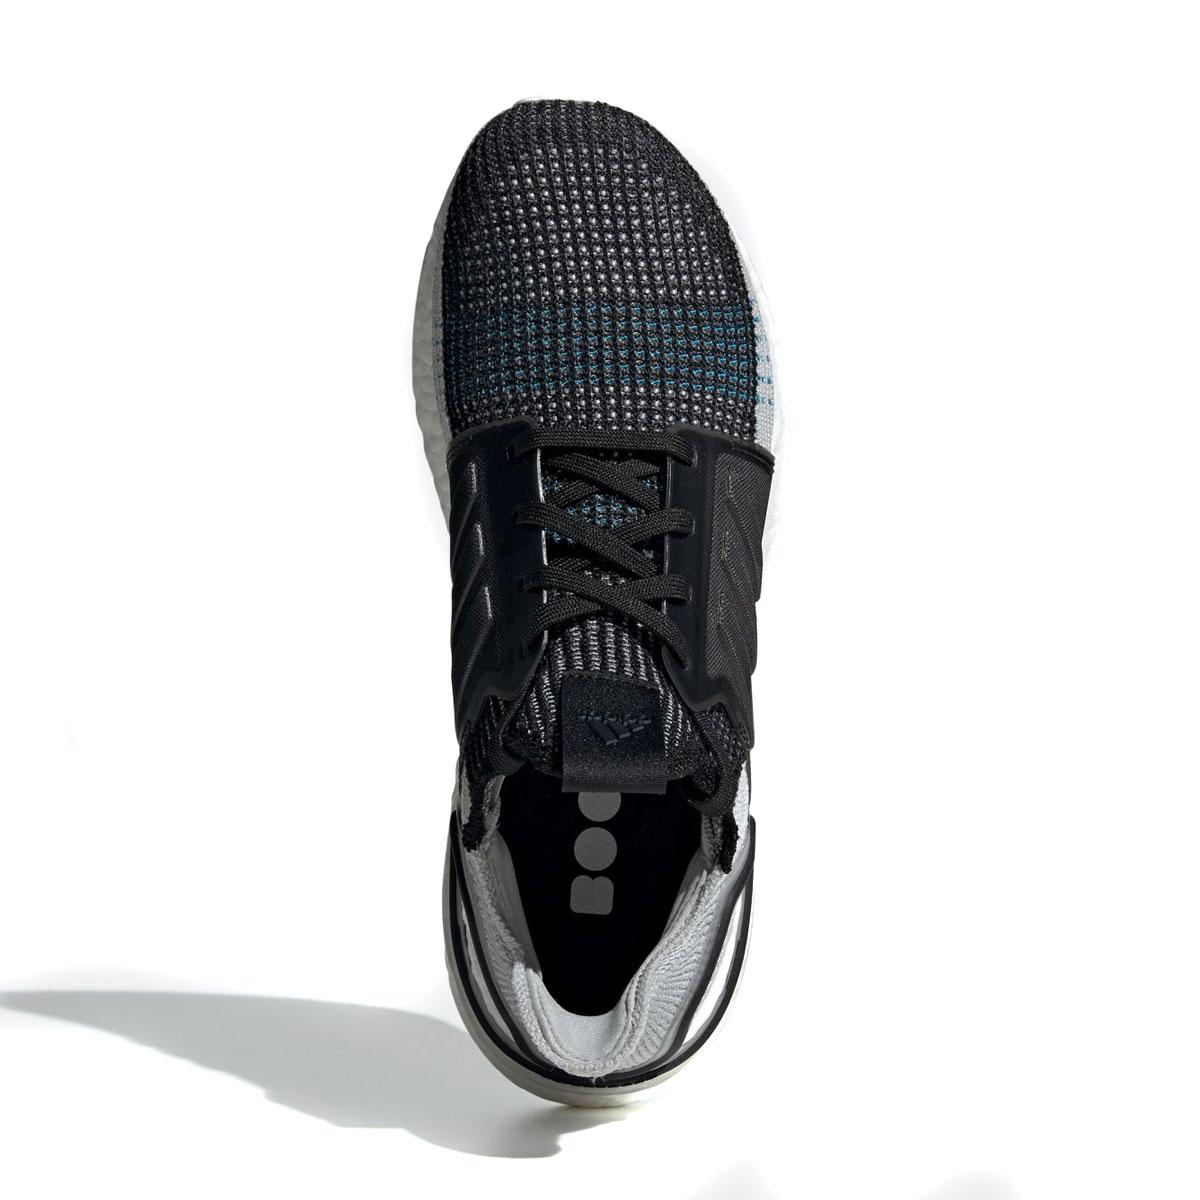 watch df46e 43a37 ... adidas UltraBOOST 19 (CORE BLACK GREY SIX SHOCK CYAN) (Adidas ultra ...